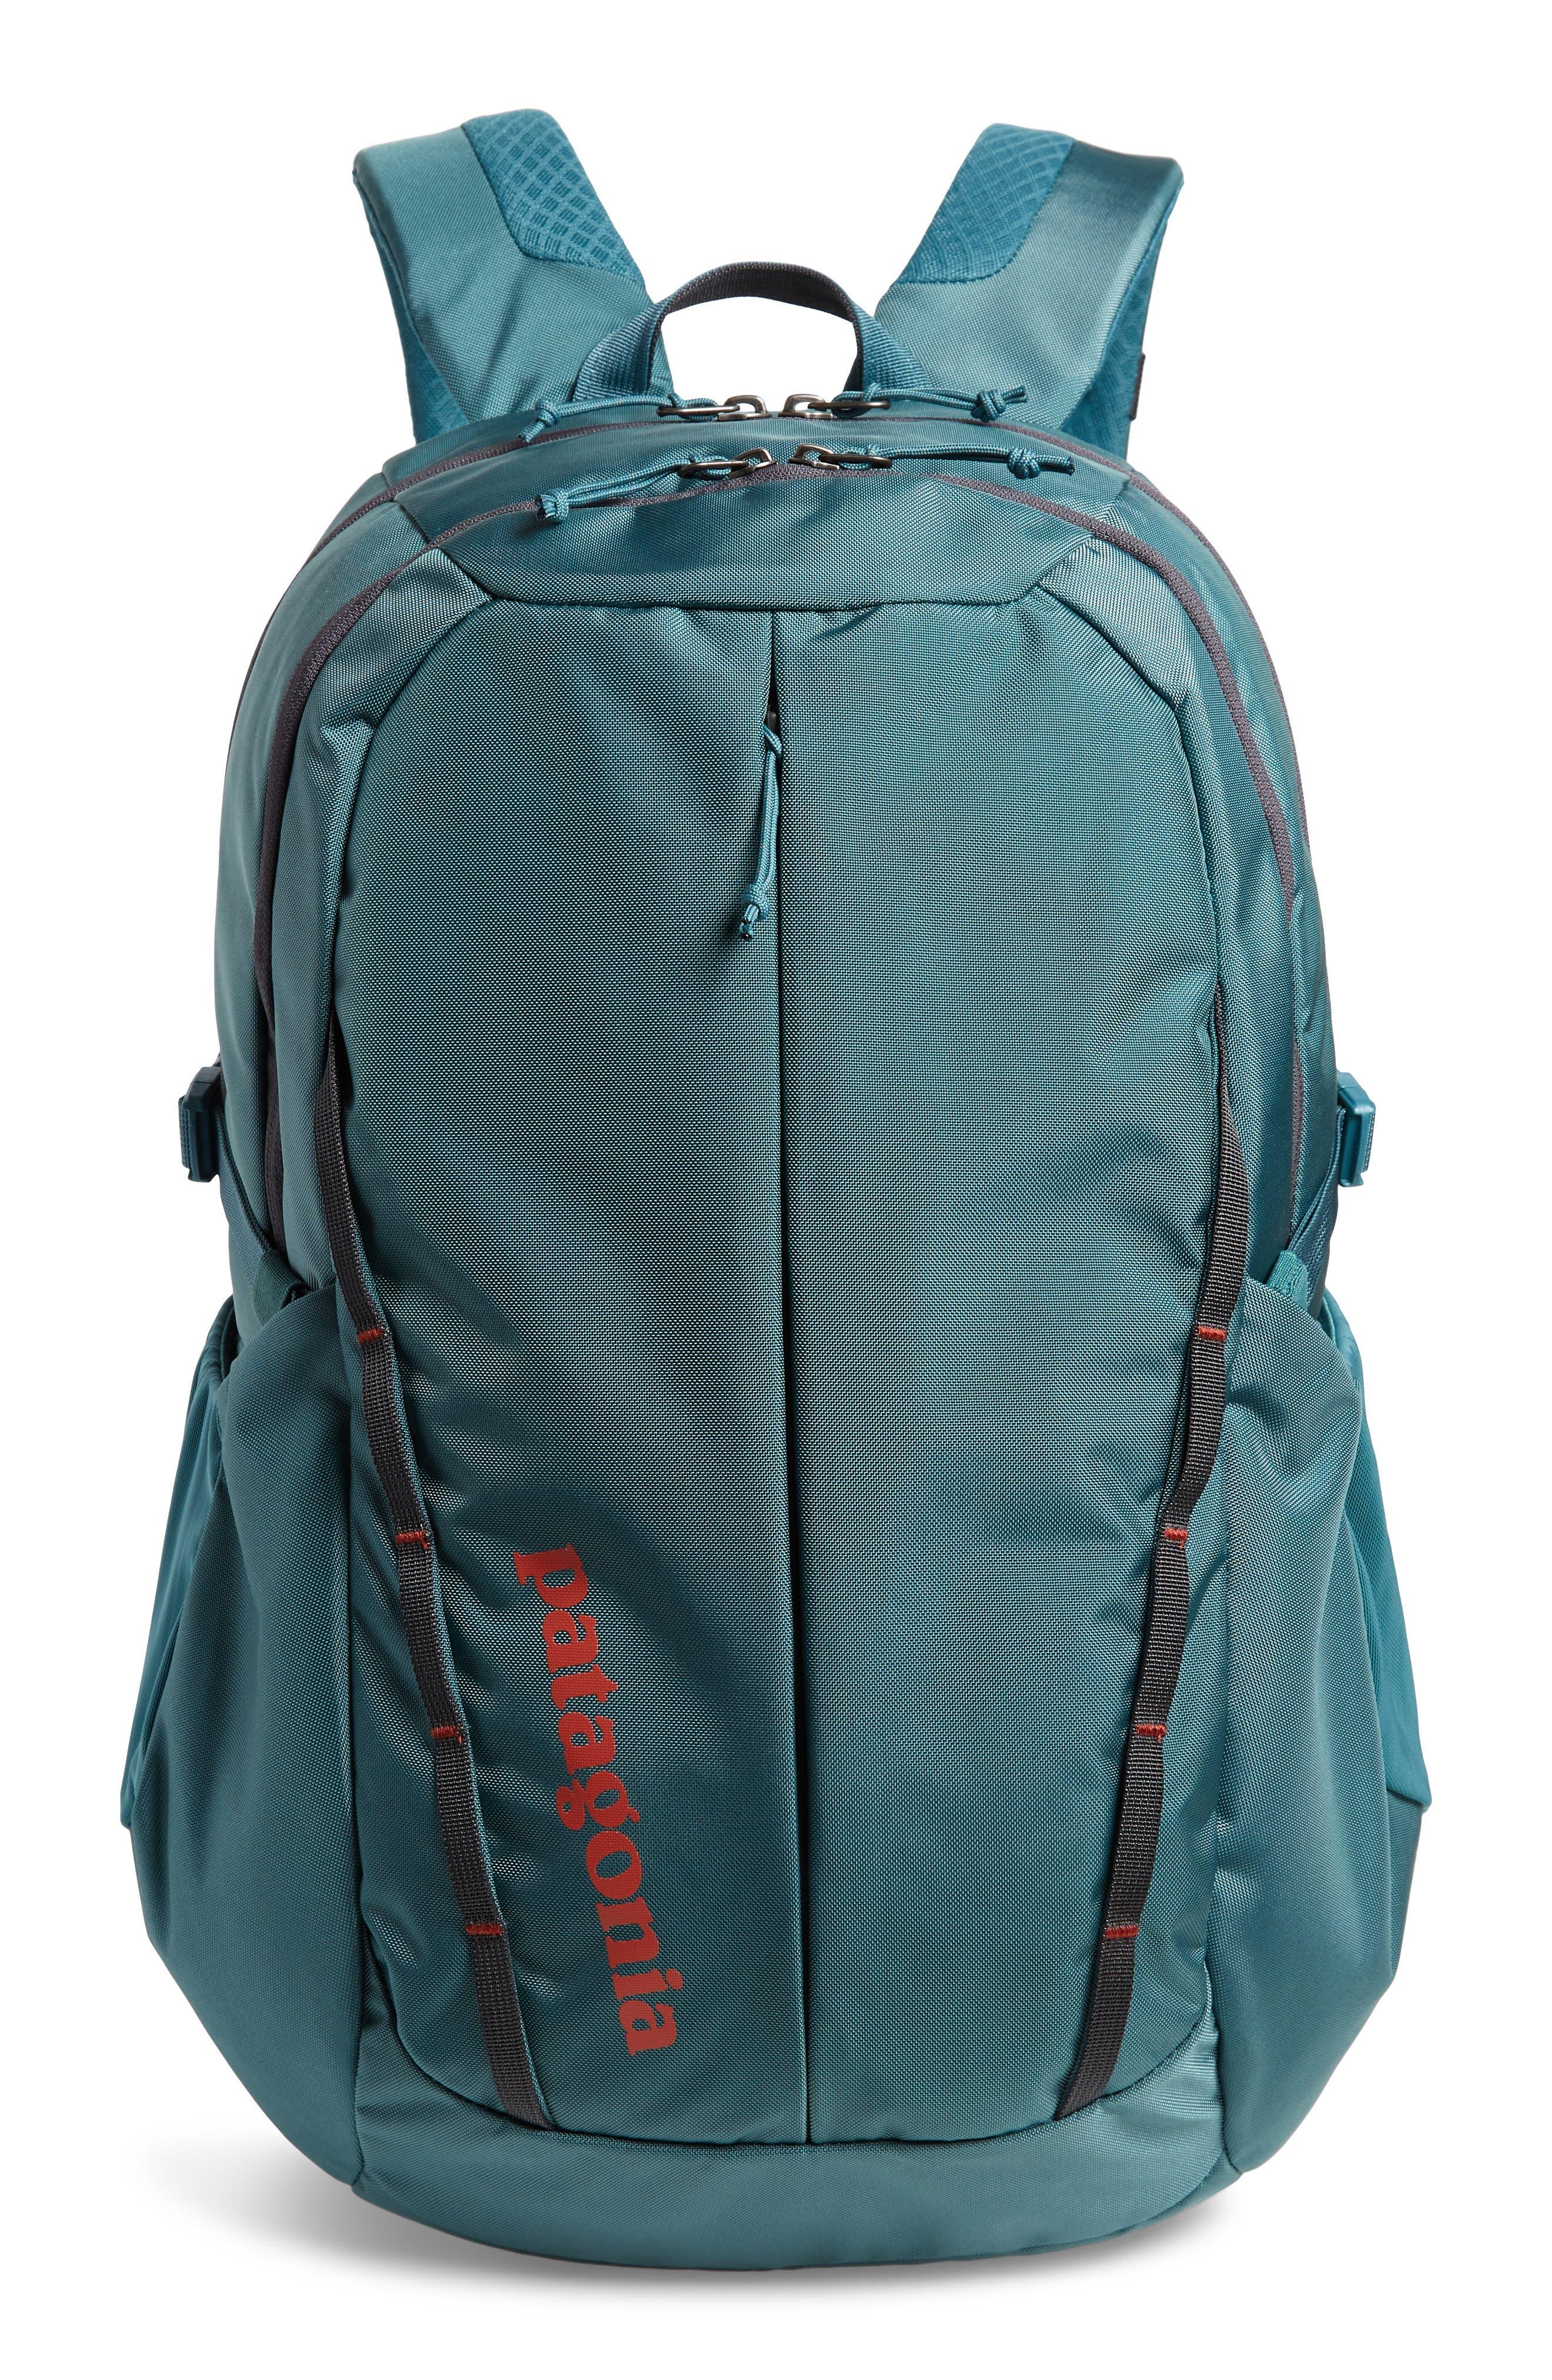 Patagonia Refugio 28-Liter Backpack - Blue